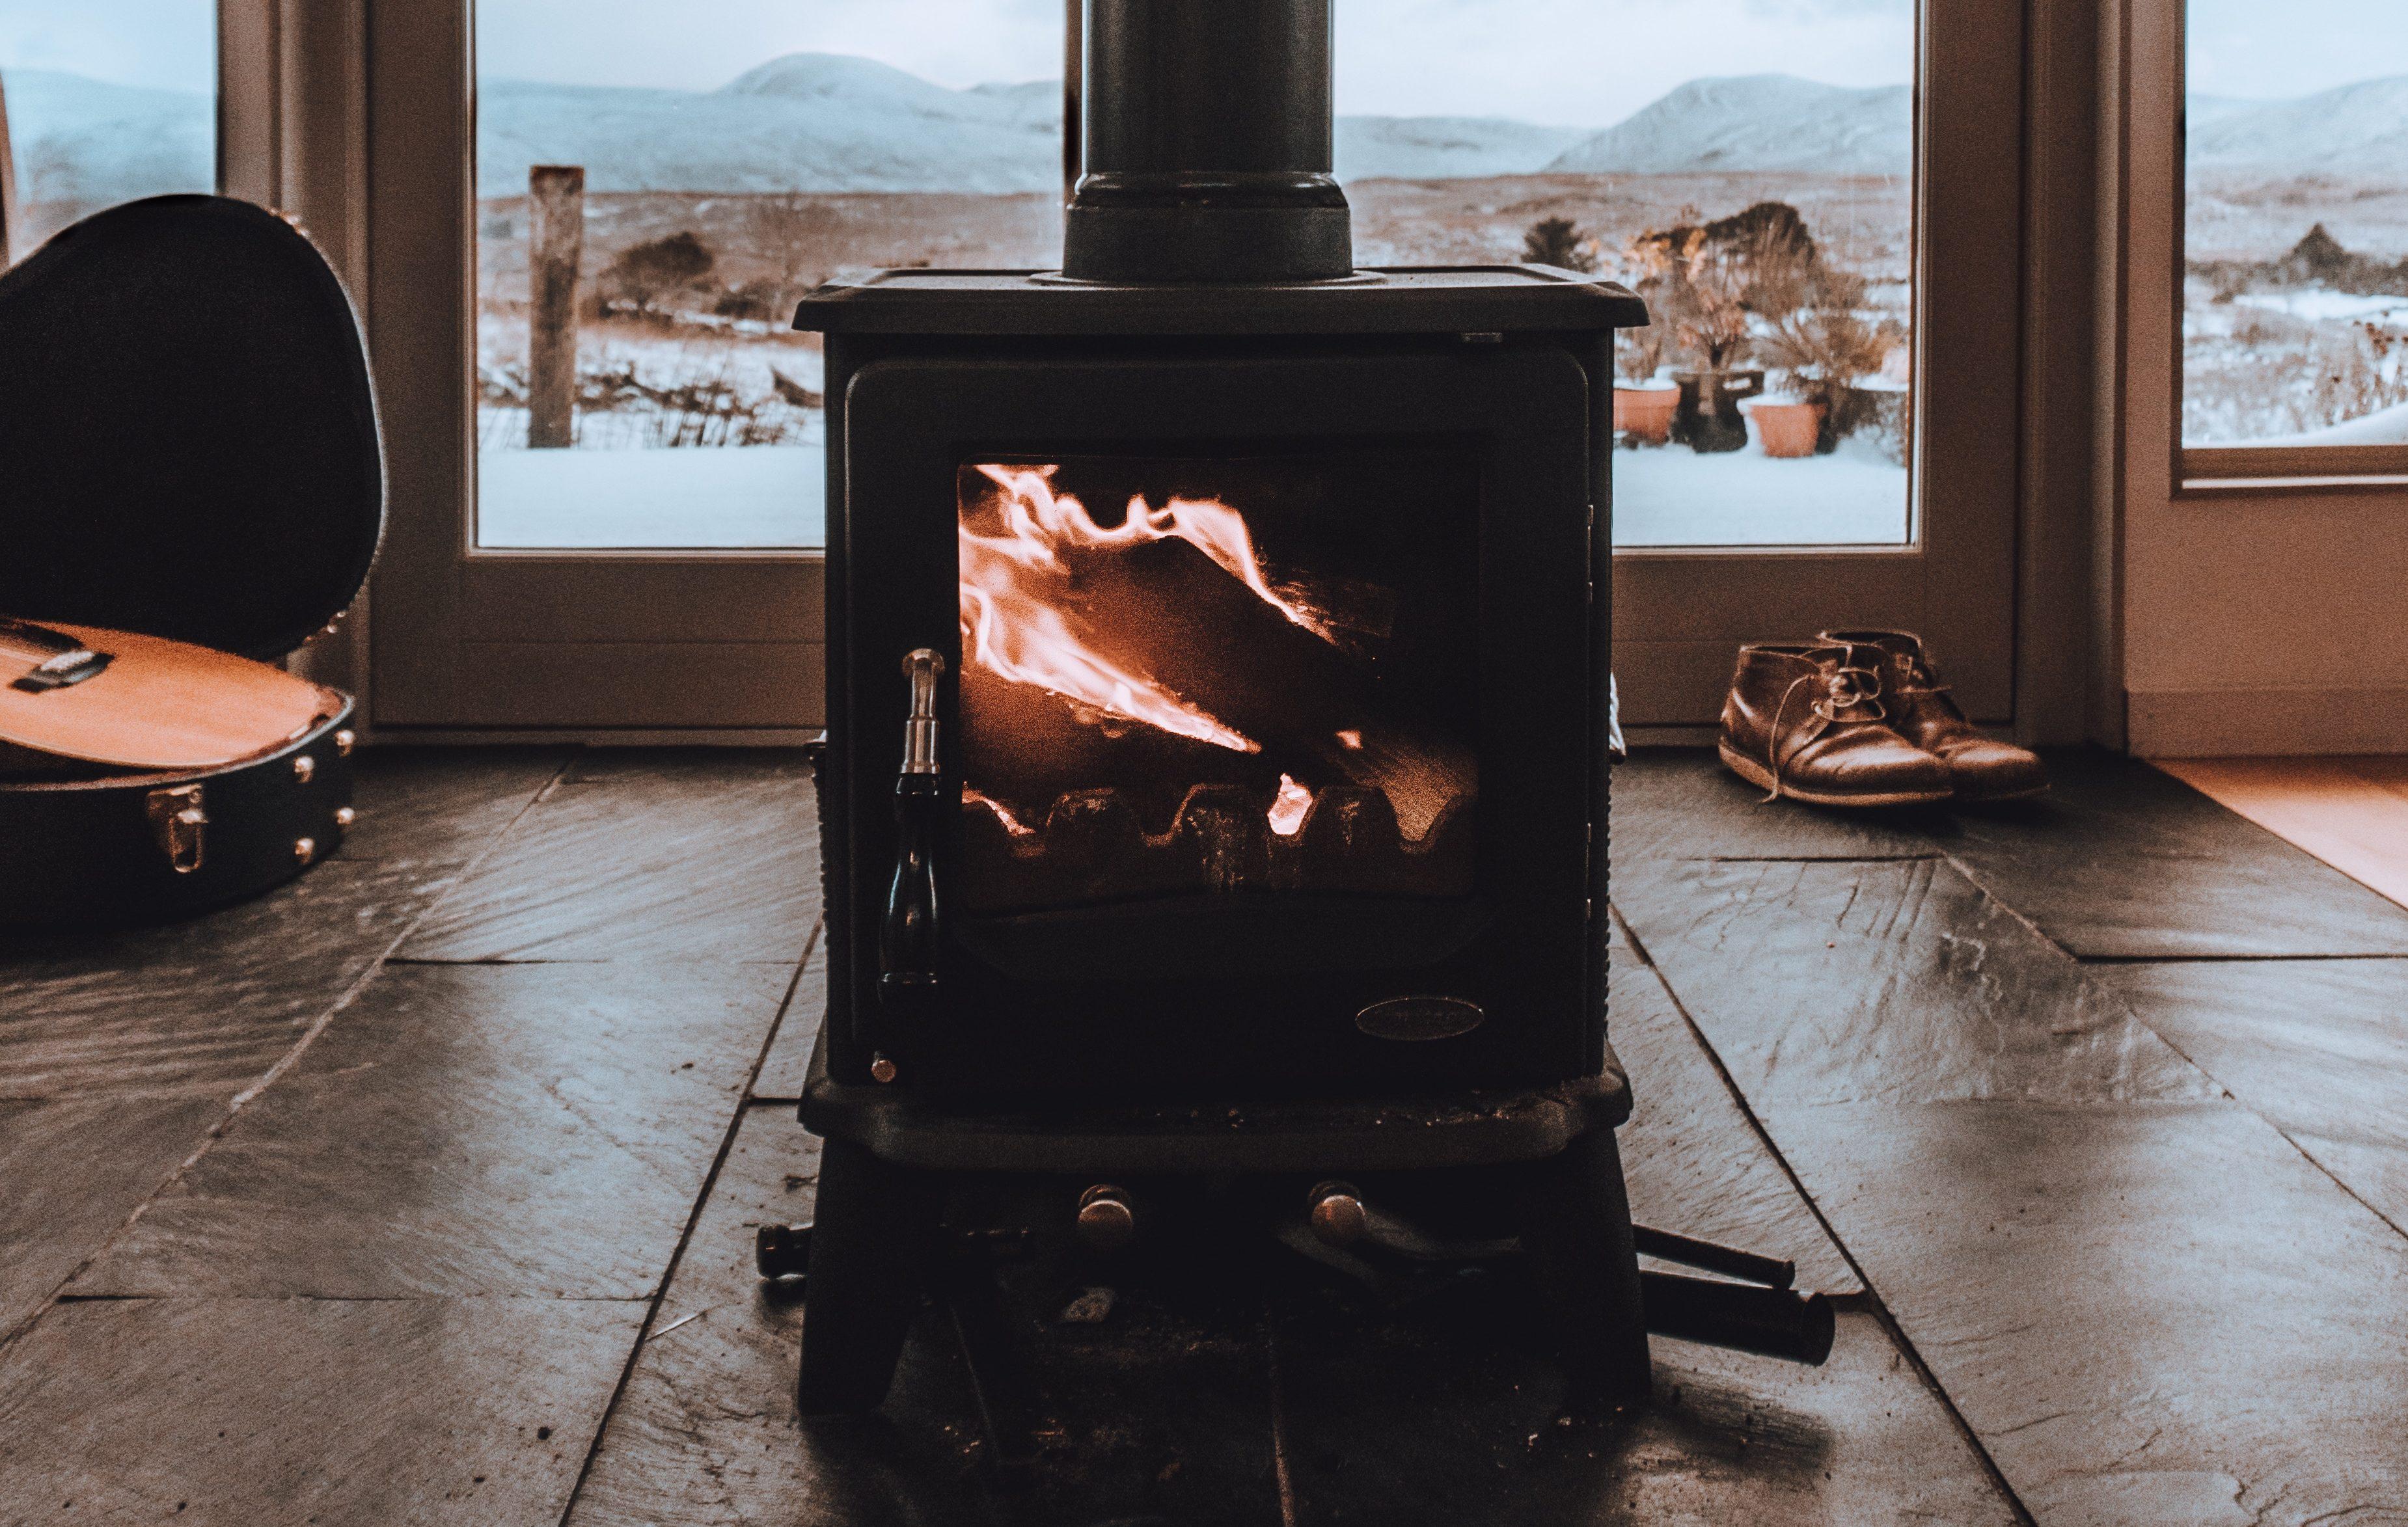 its a bit chilly - log burner